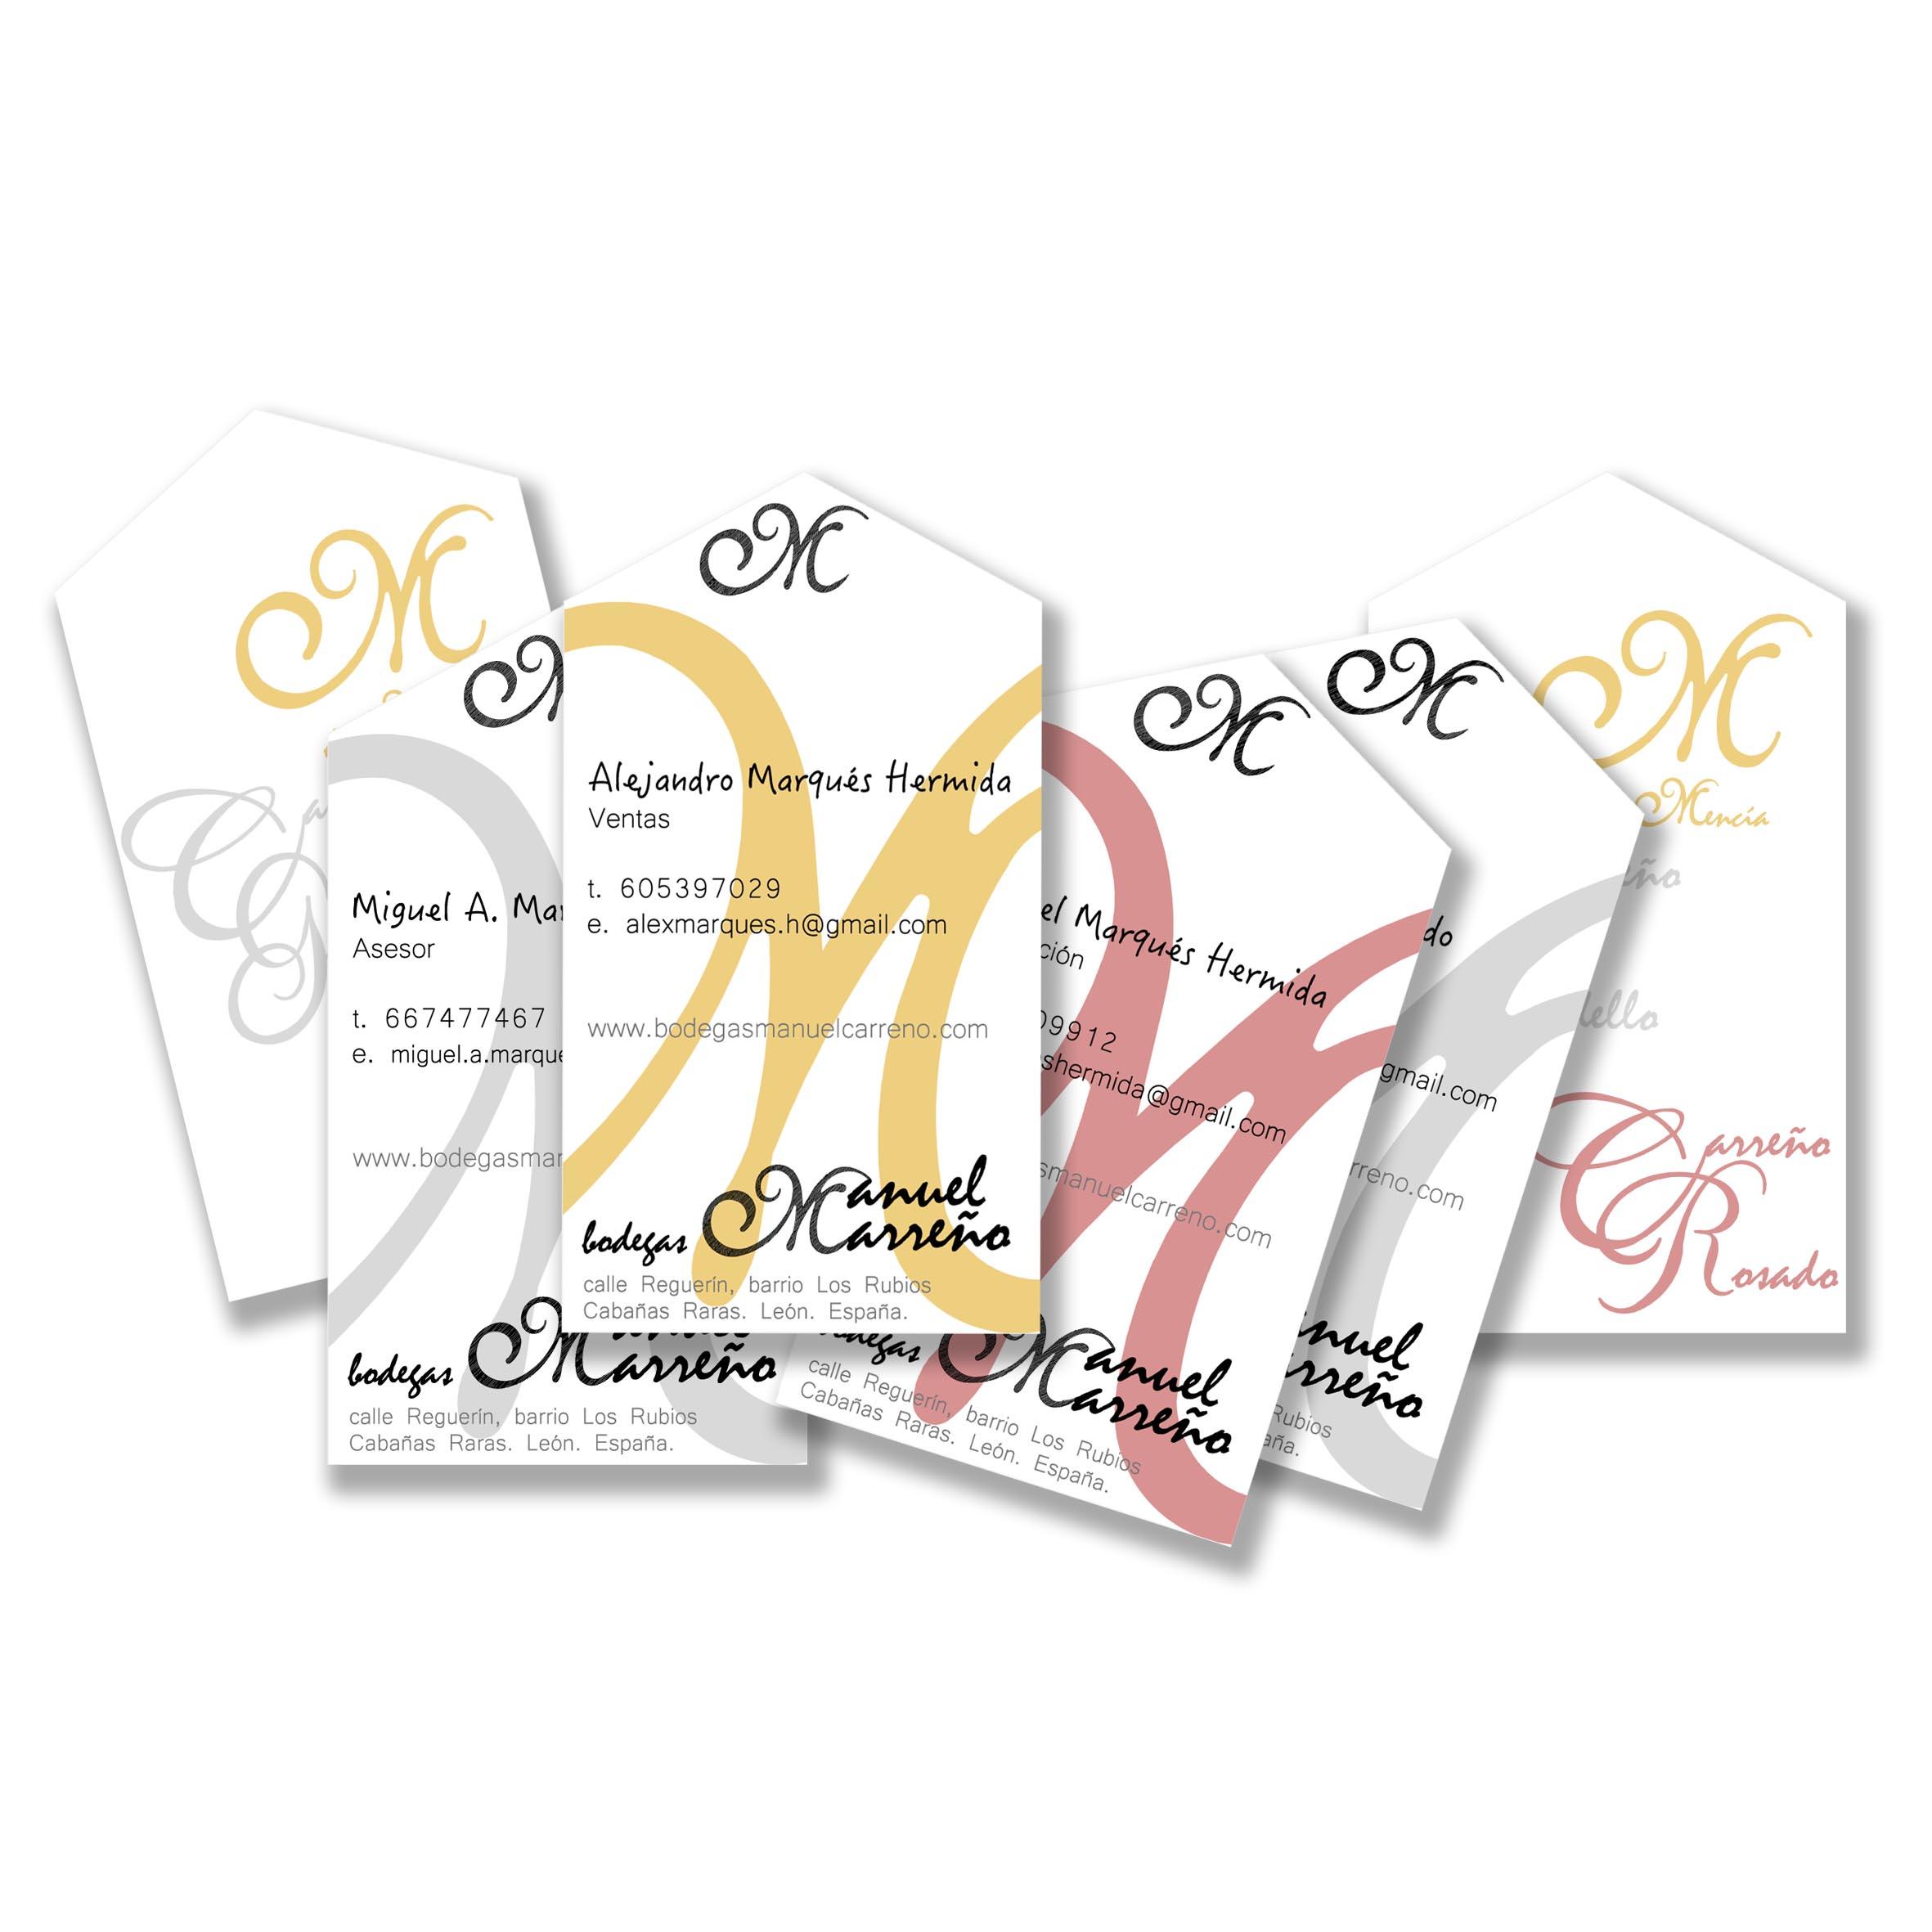 20130205_Collage tarjetas.jpg